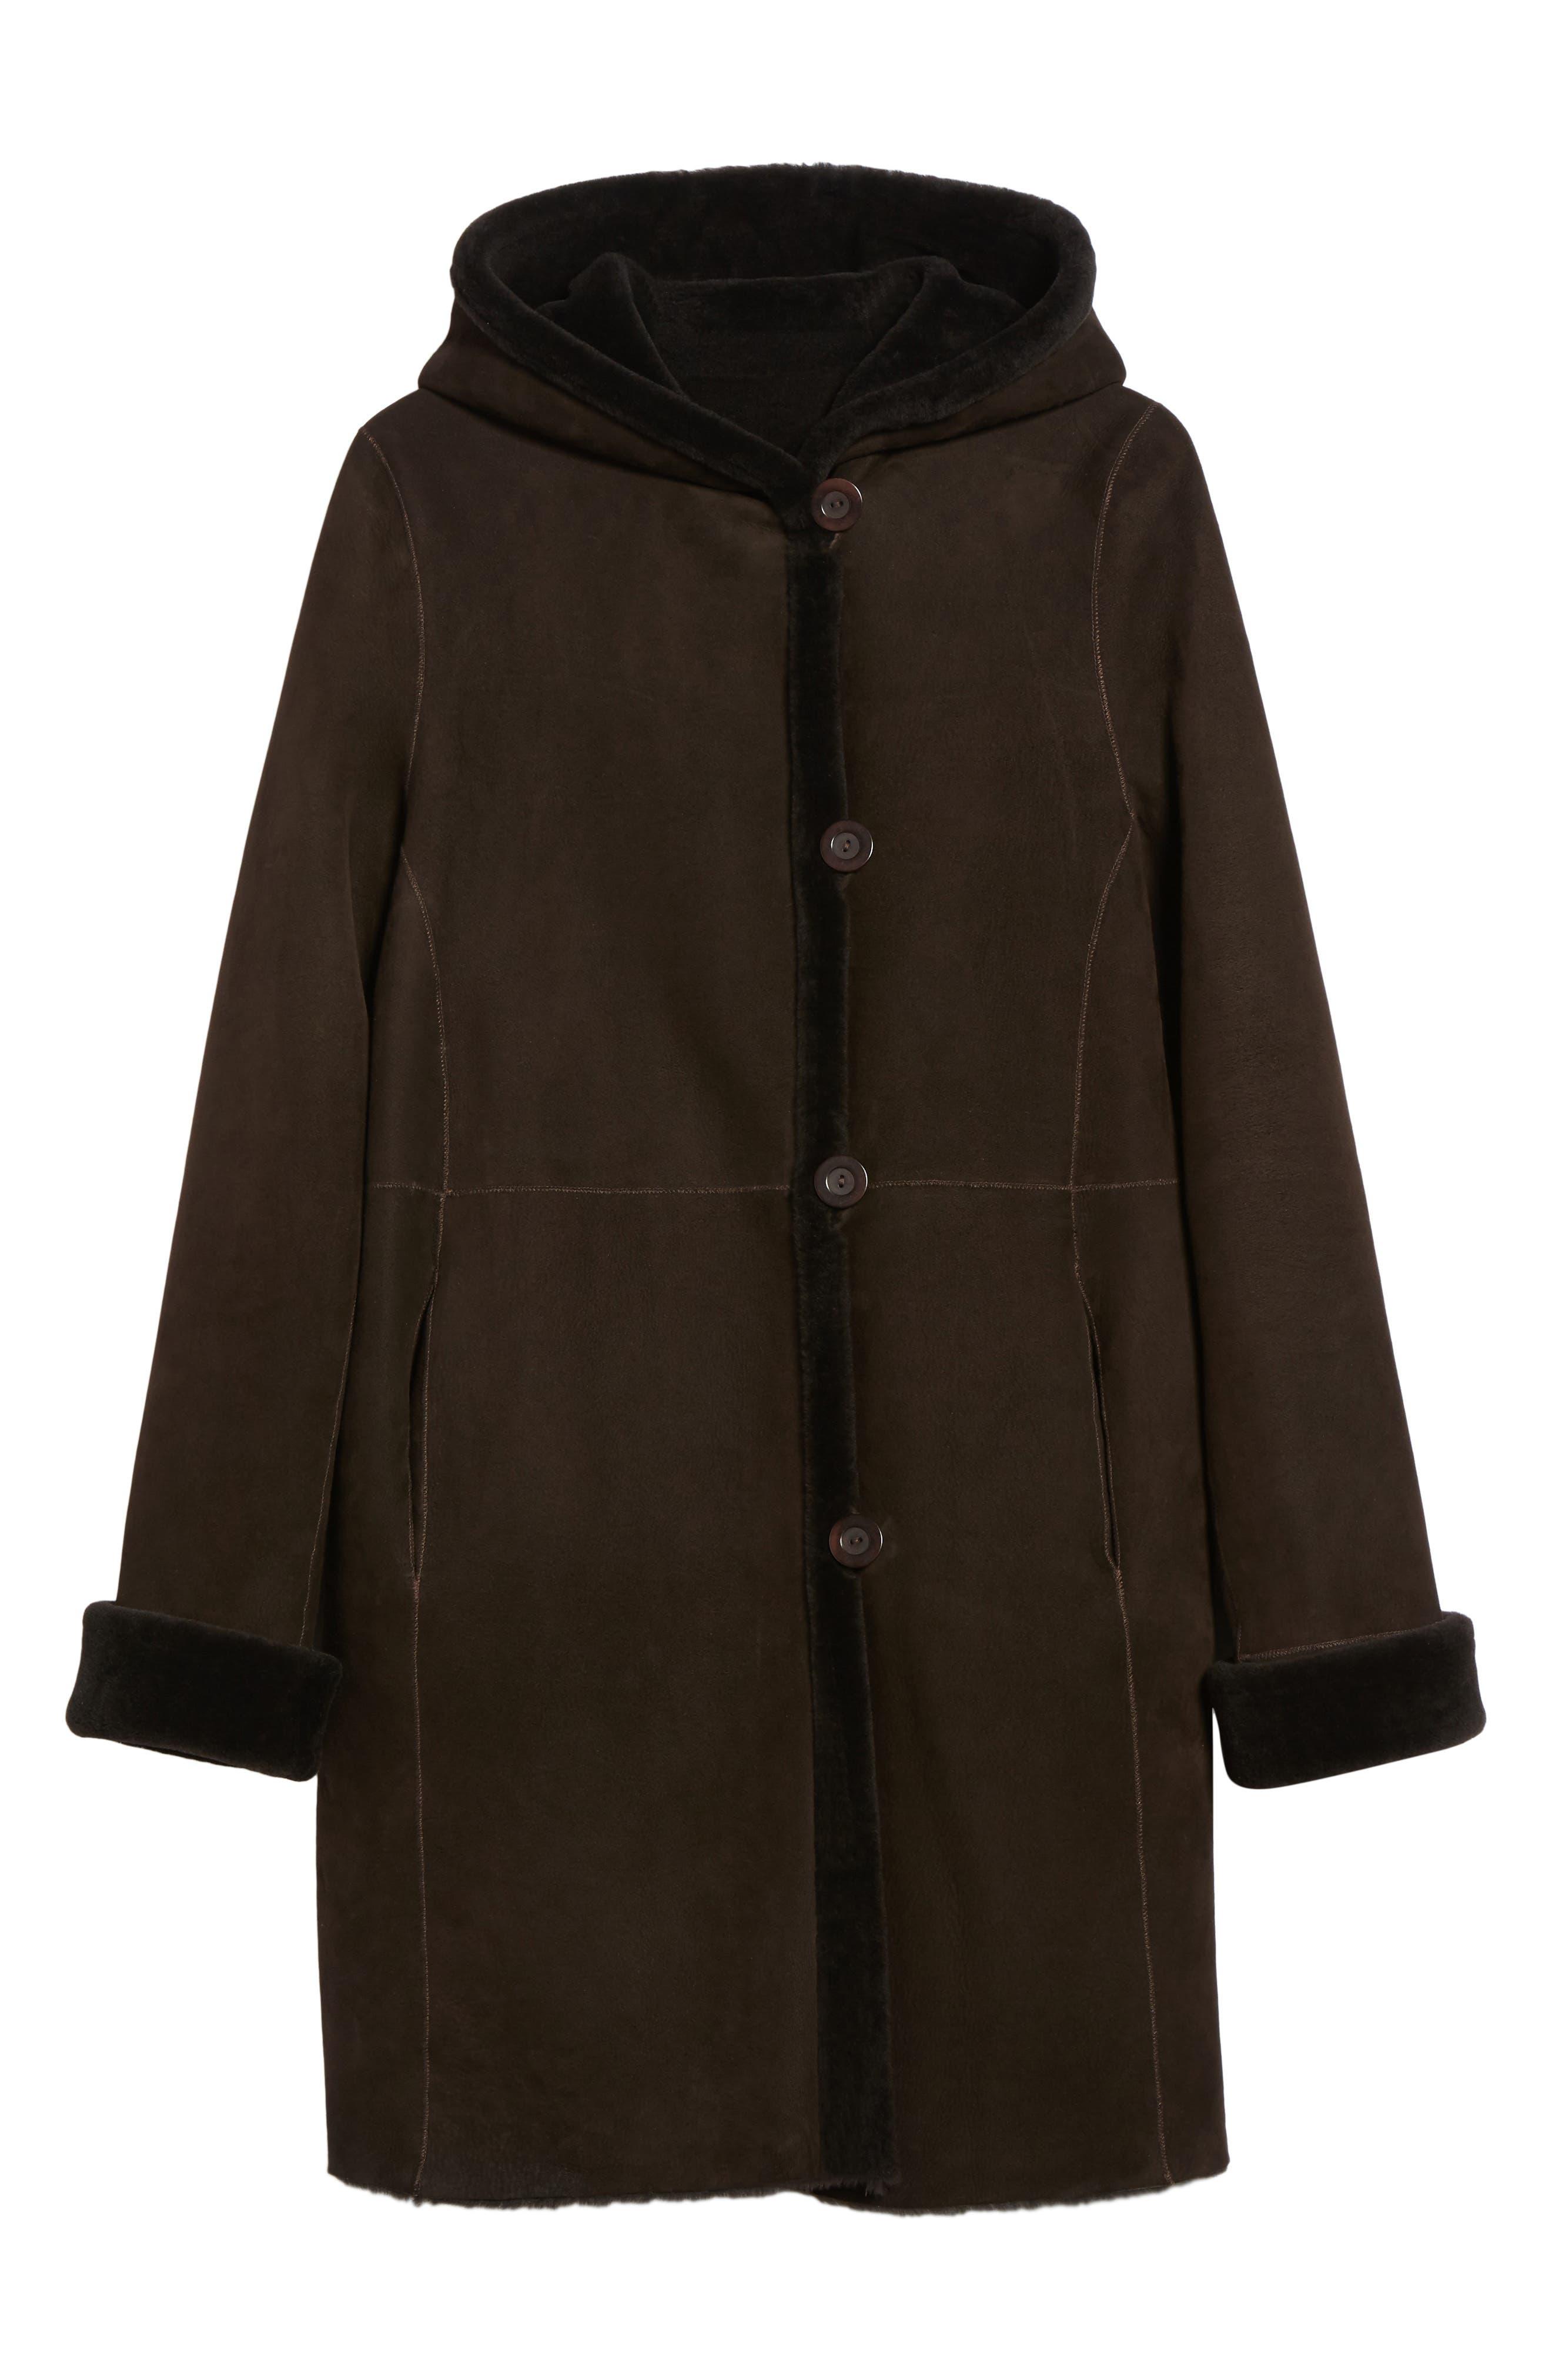 Hooded Genuine Shearling Coat,                             Alternate thumbnail 5, color,                             206